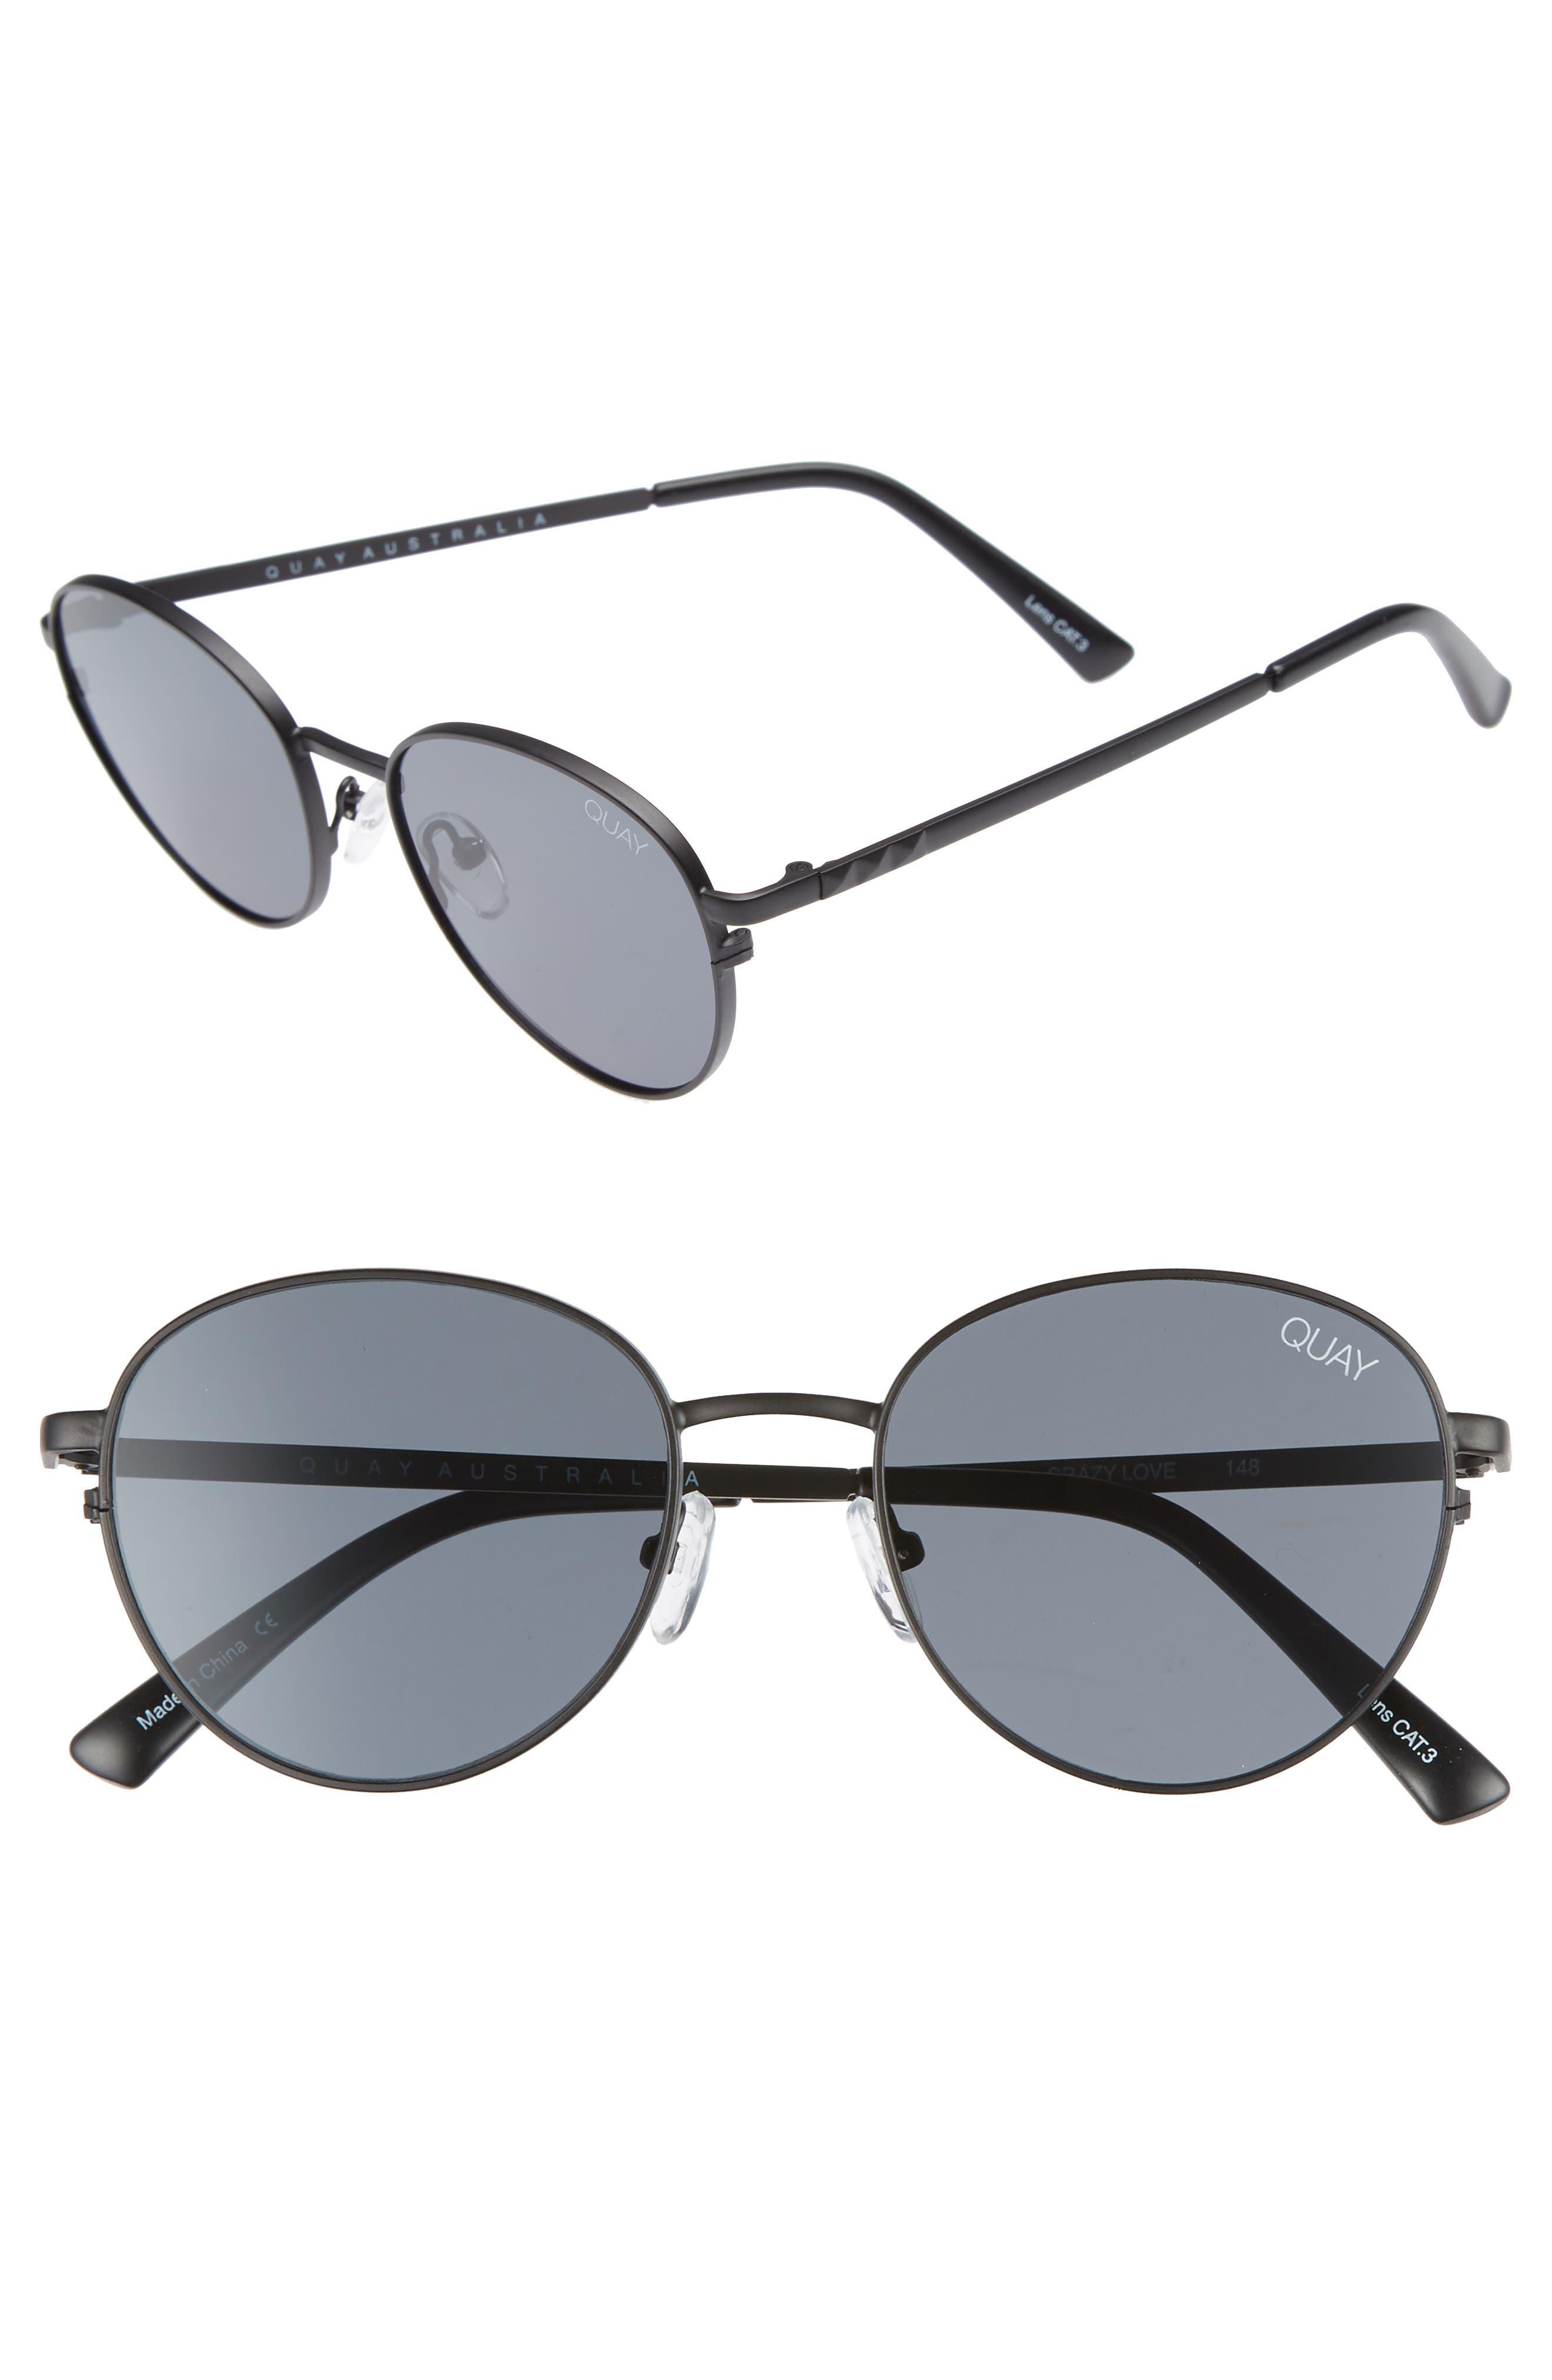 Quay Australia Crazy Love 45Mm Round Sunglasses - Black/ Smoke